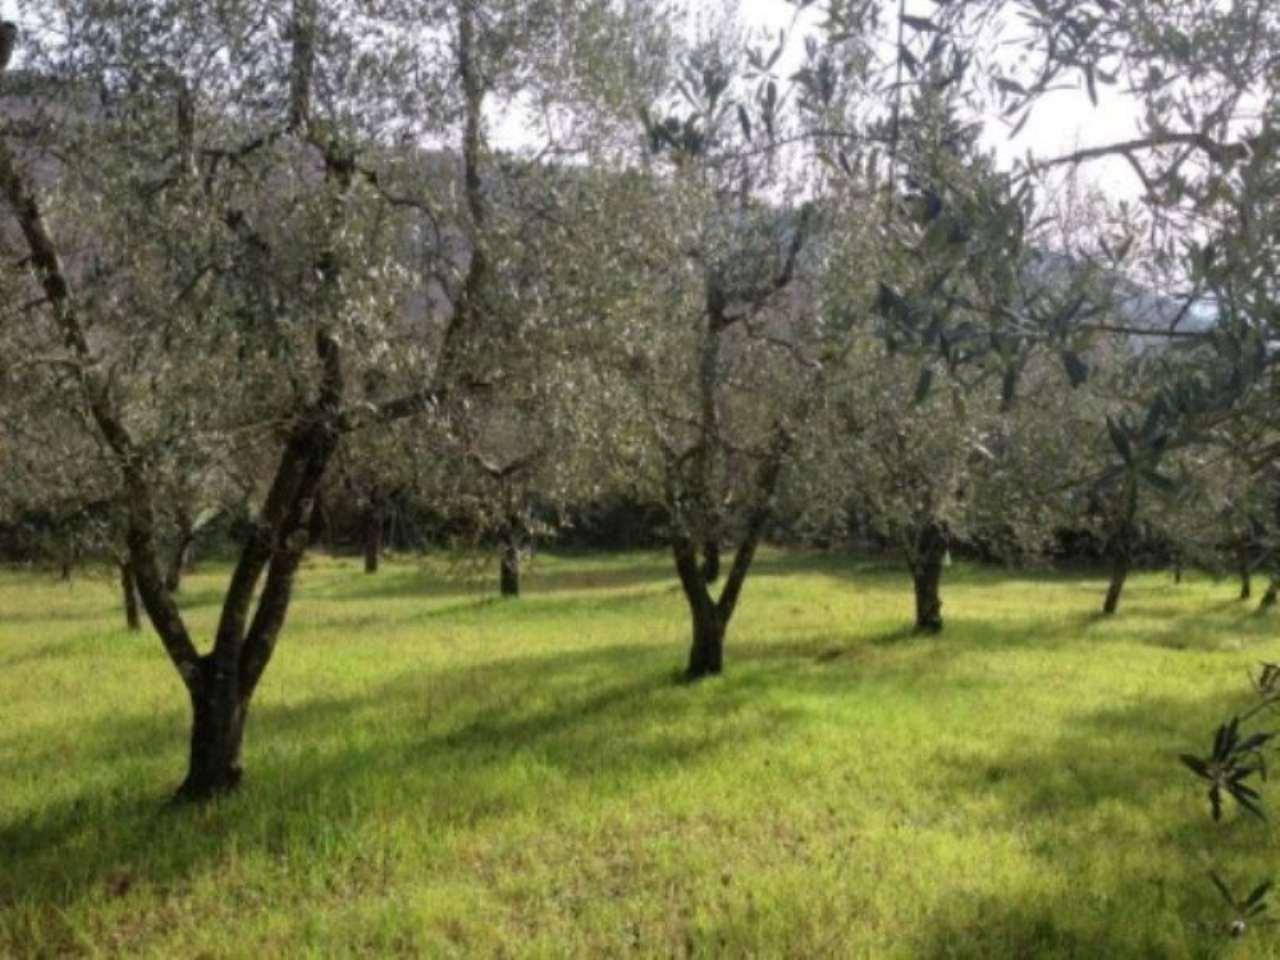 Terreno commerciale in Vendita a Fiesole Periferia: 5000 mq